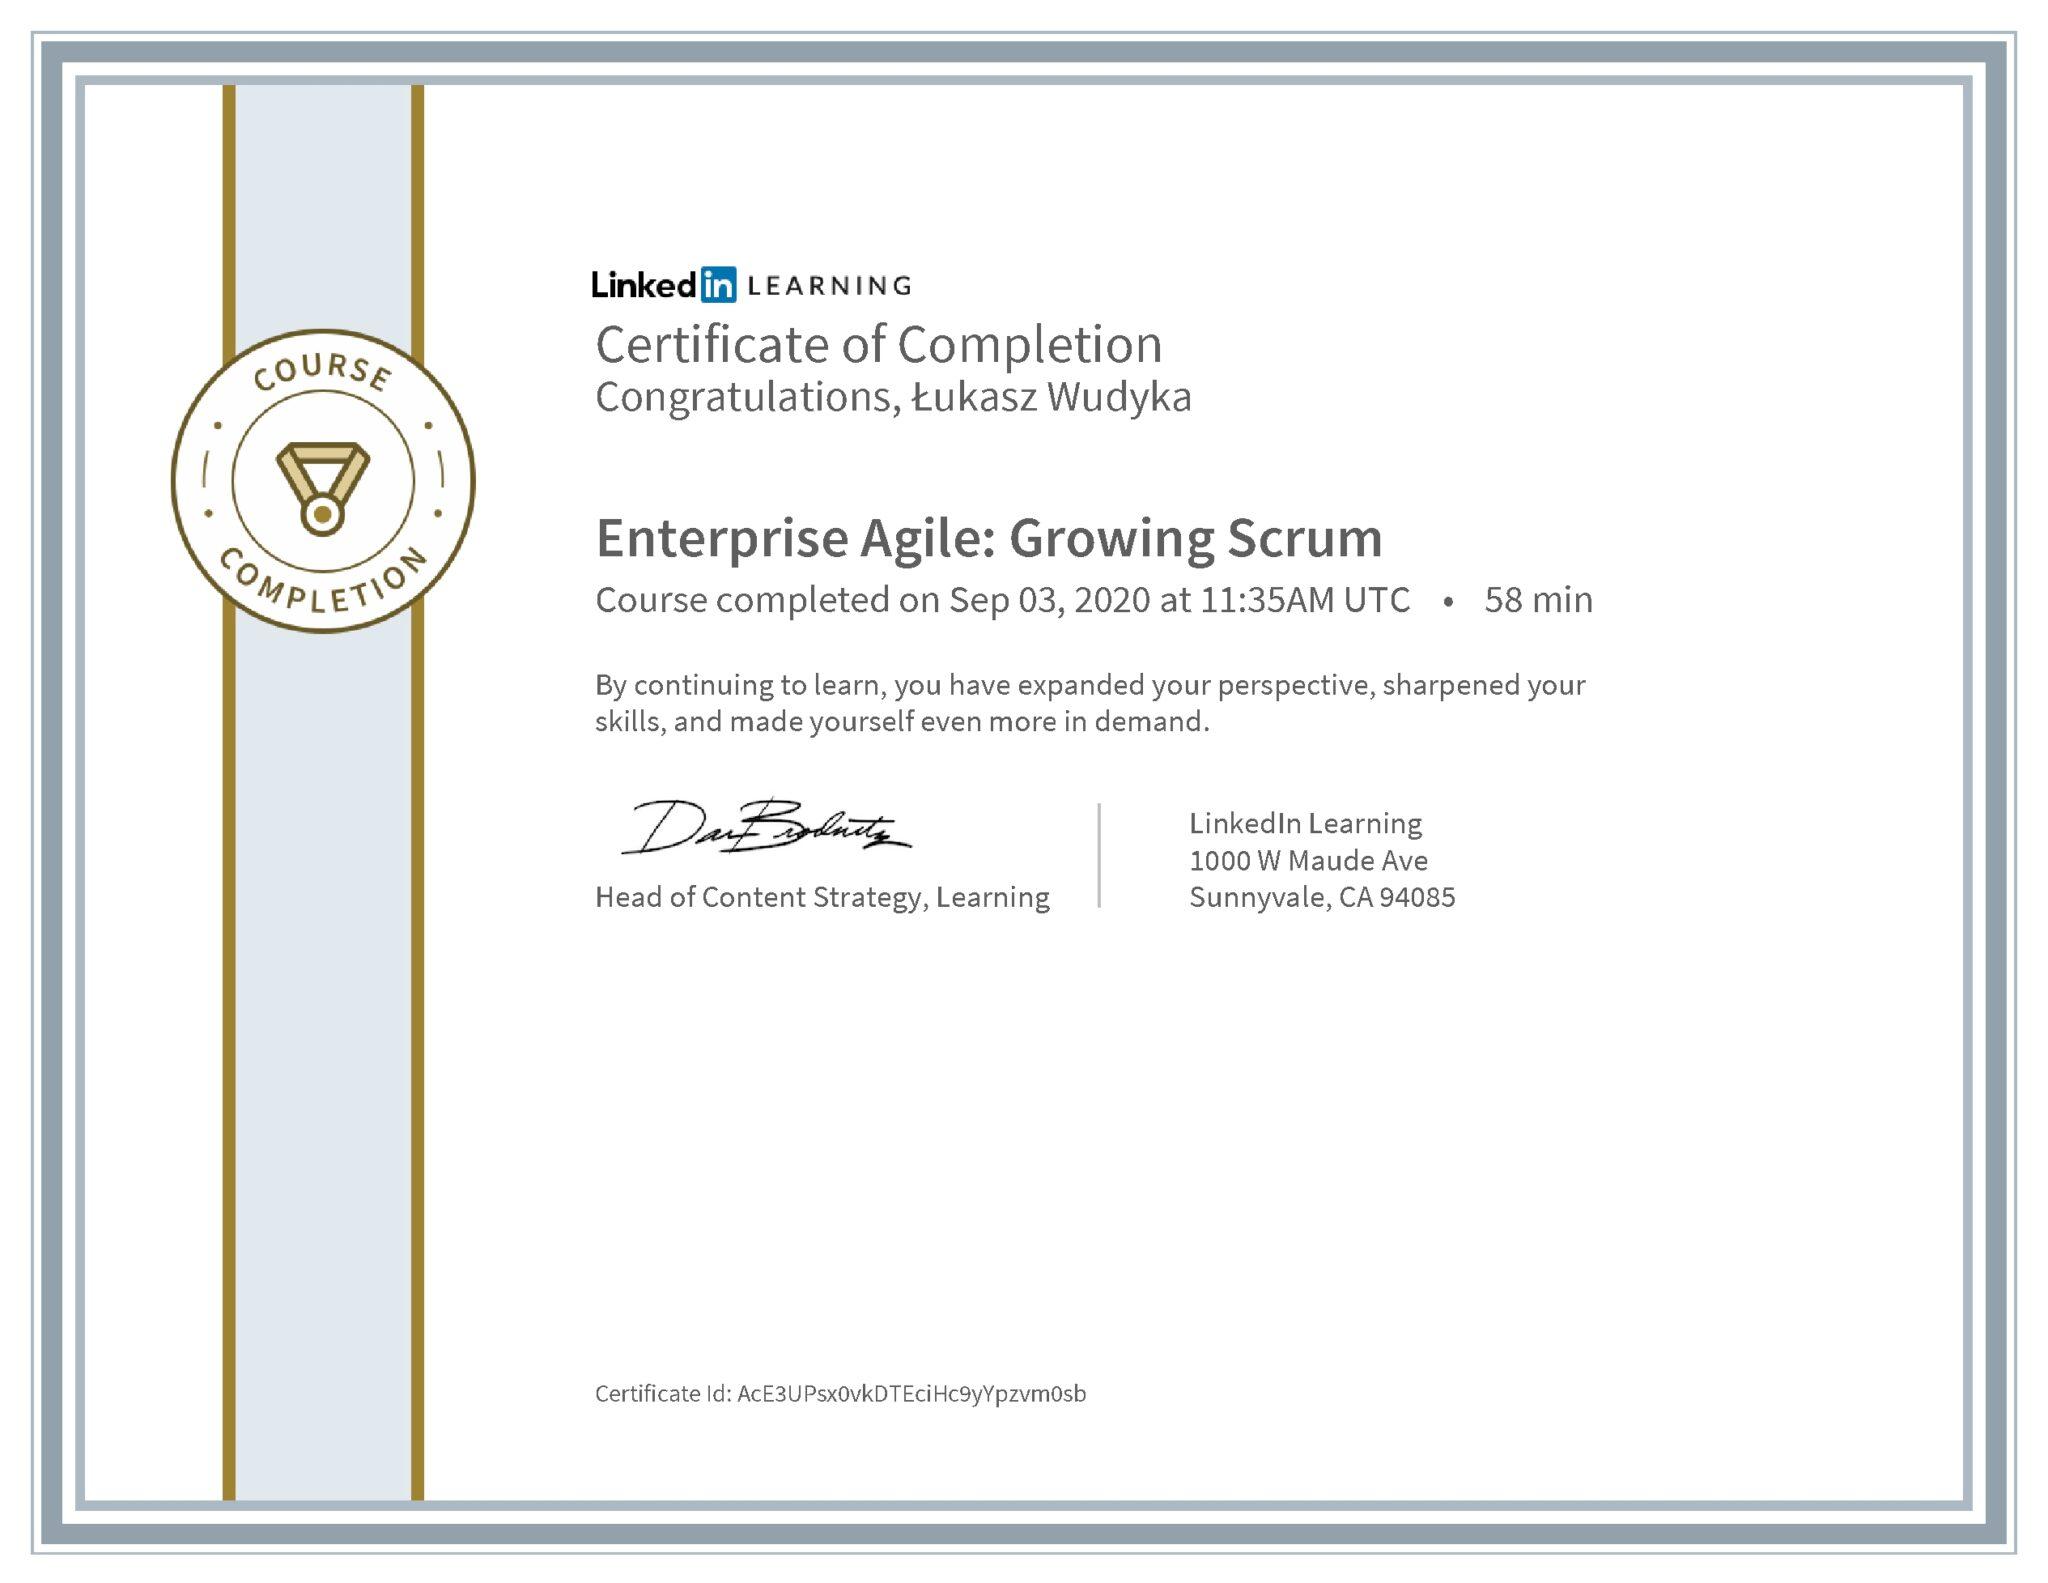 Łukasz Wudyka certyfikat LinkedIn Enterprise Agile: Growing Scrum